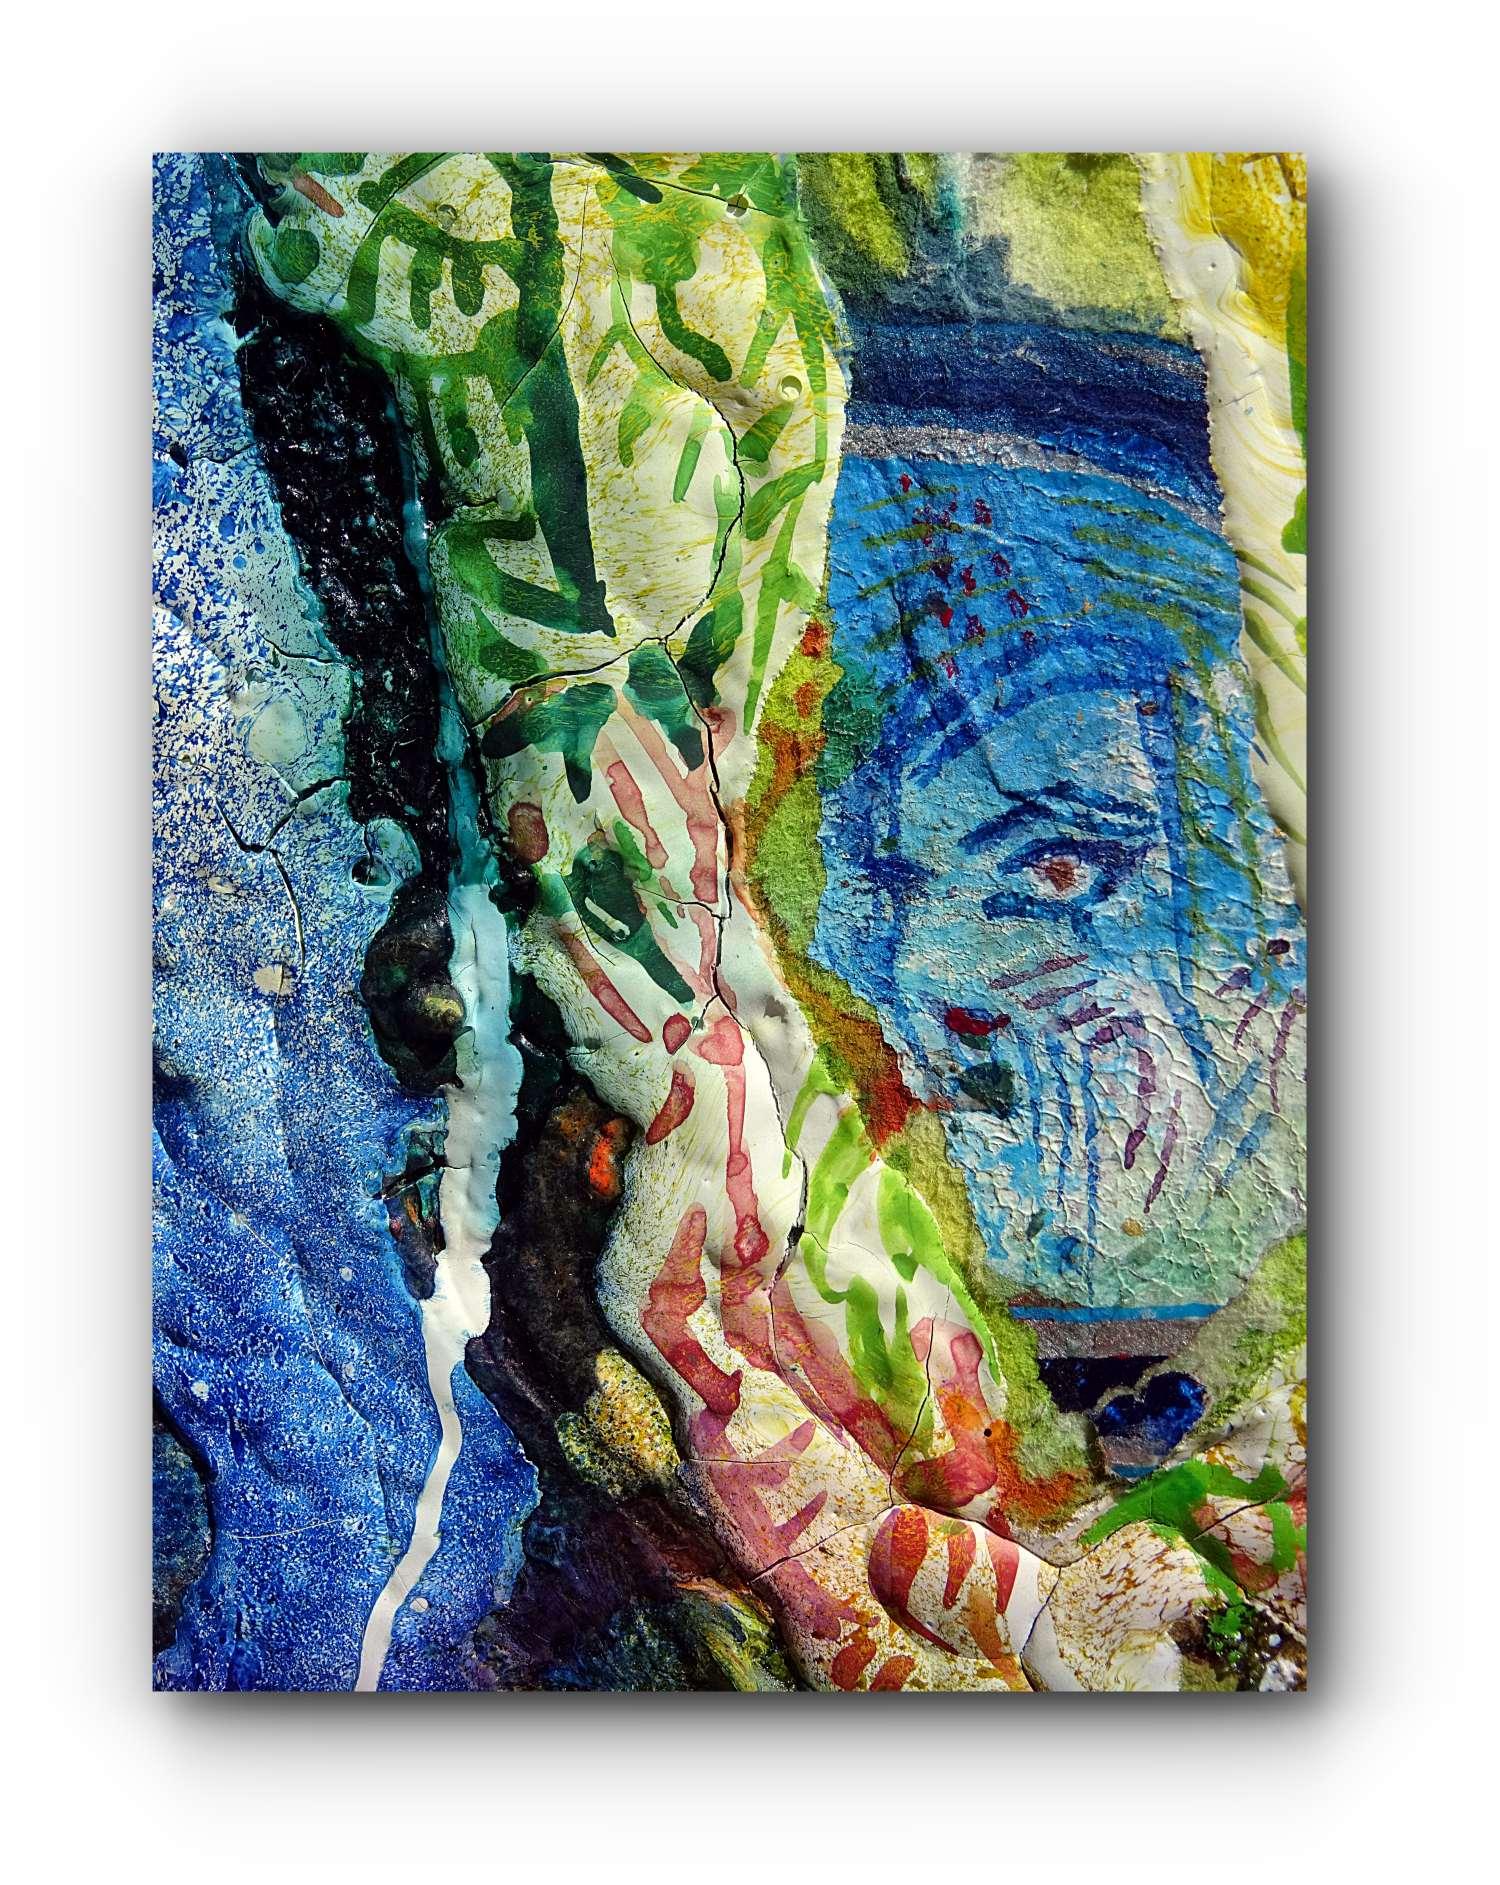 painting-detail-1-kiss-artist-duo-ingress-vortices.jpg